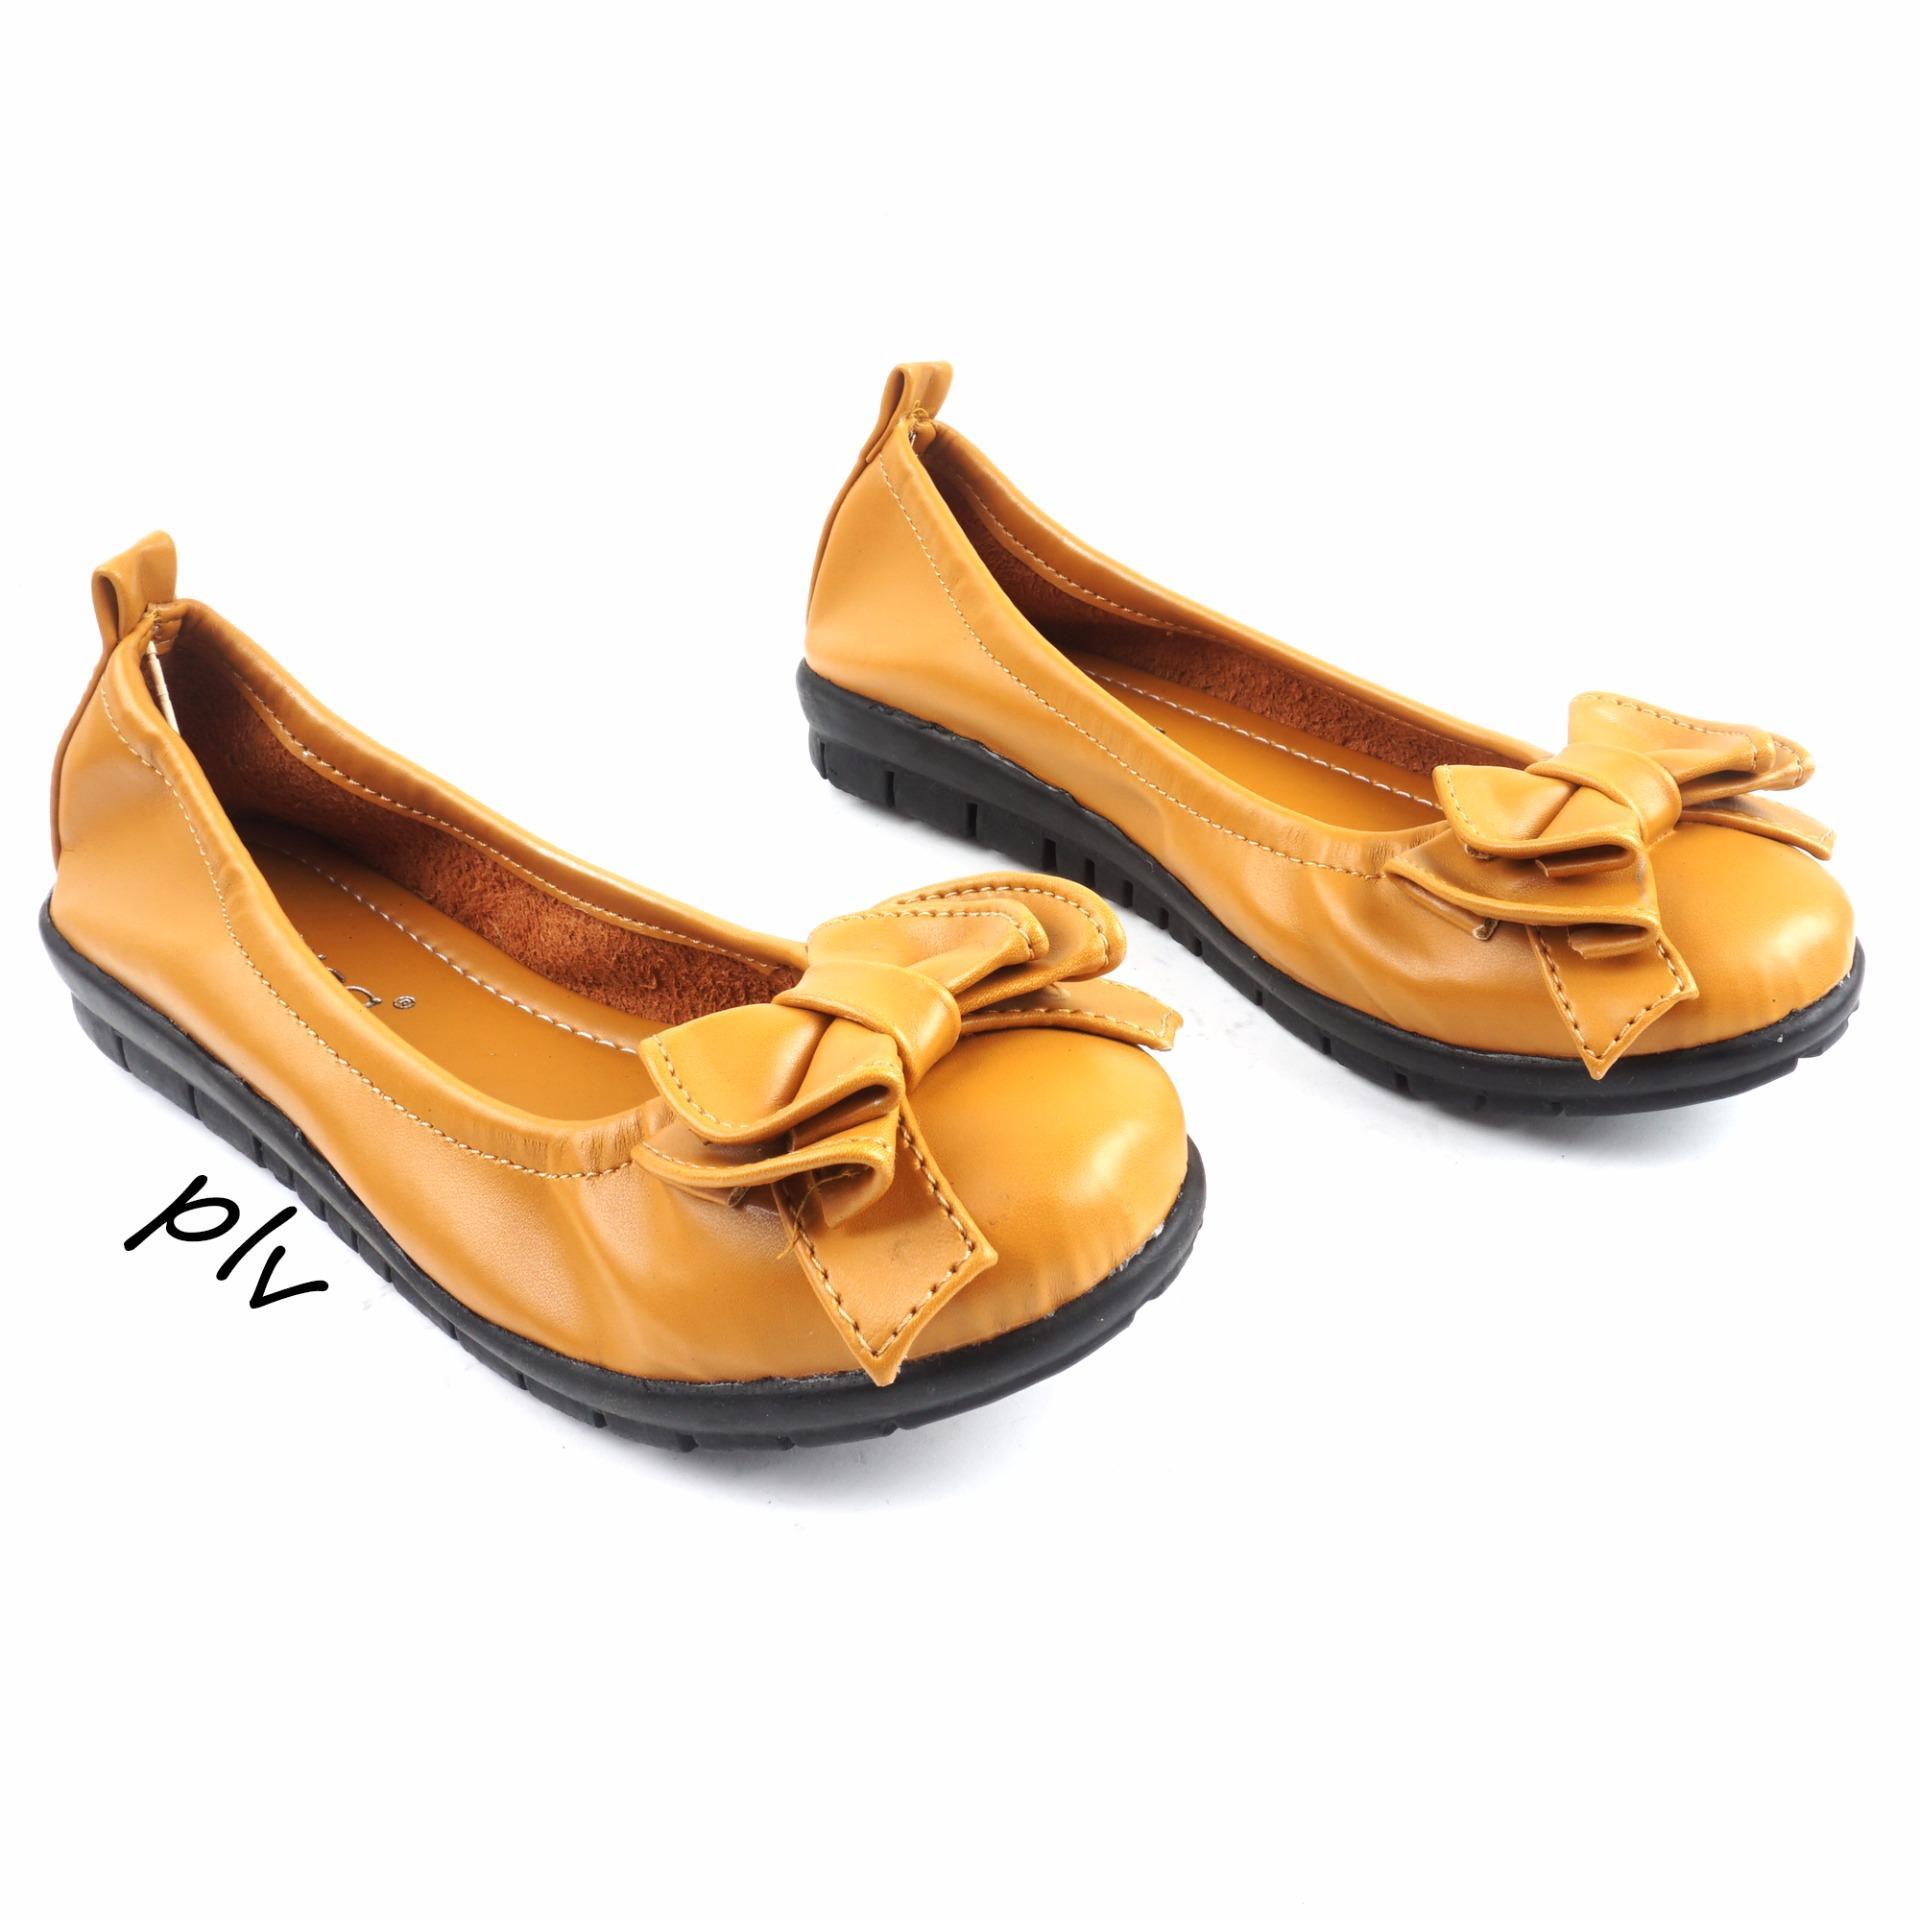 Gratica Sepatu Flat Shoes AS31 - Kunyit